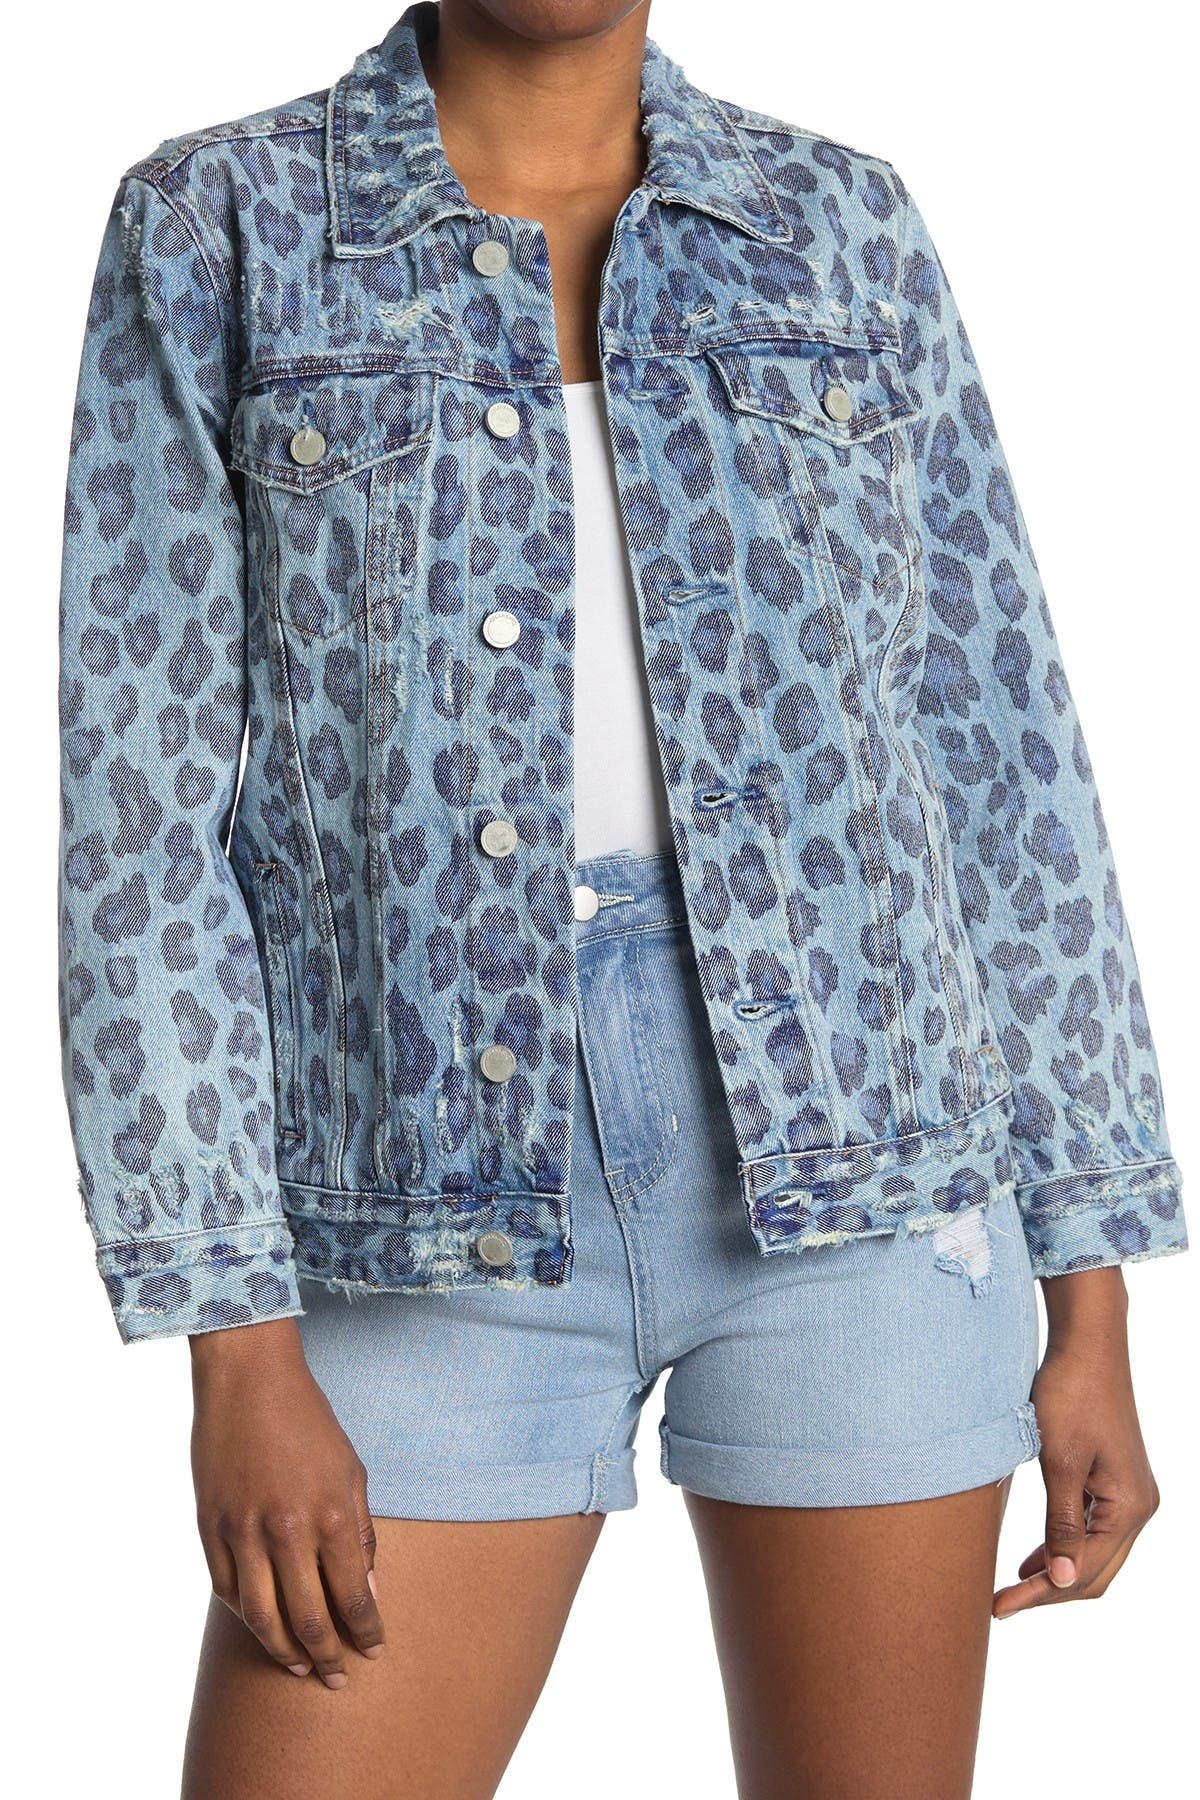 Image of BLANKNYC Denim Welcome To The Jungle Denim Jacket